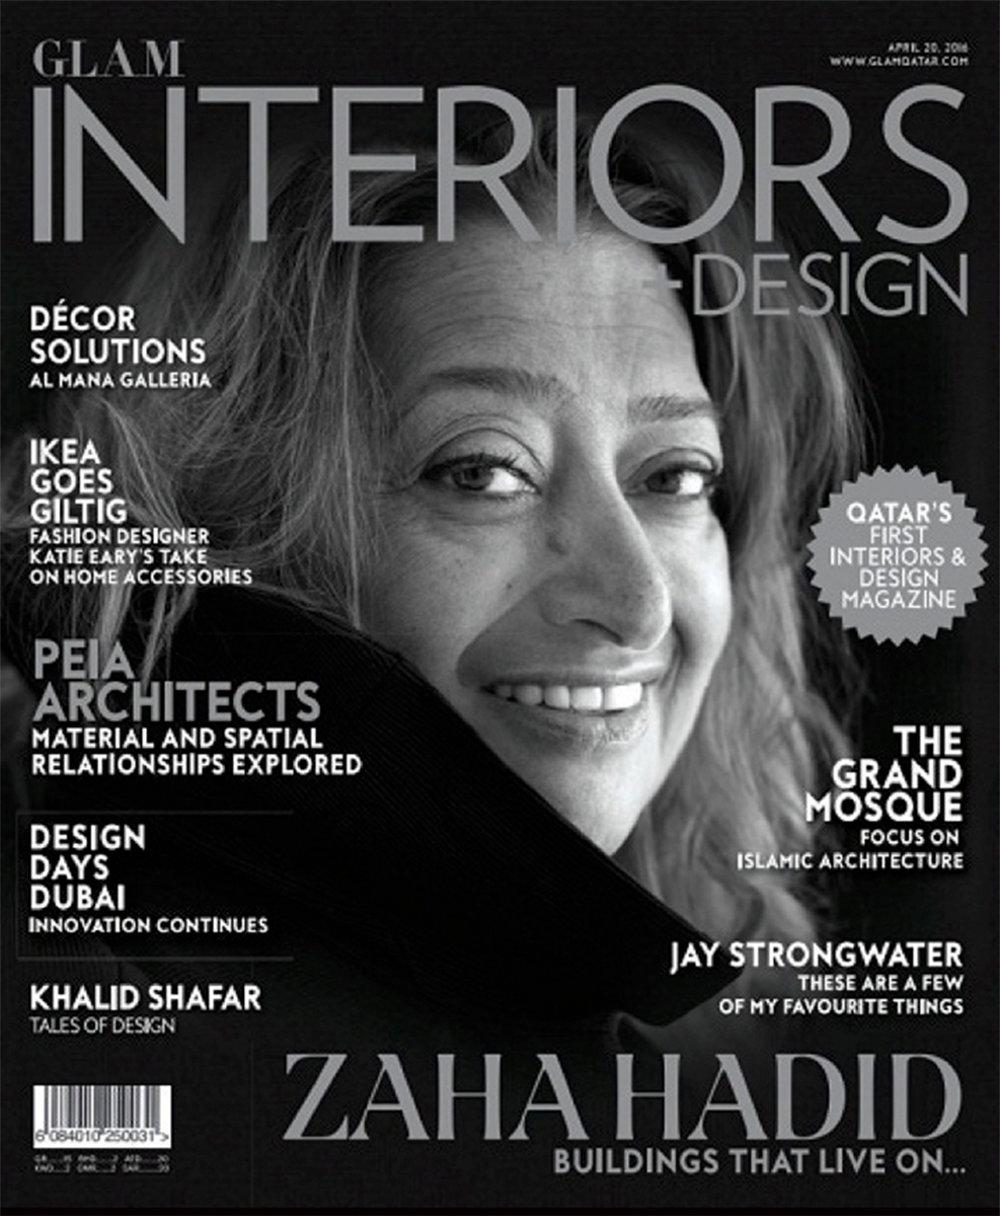 interiors_web_cover.jpg